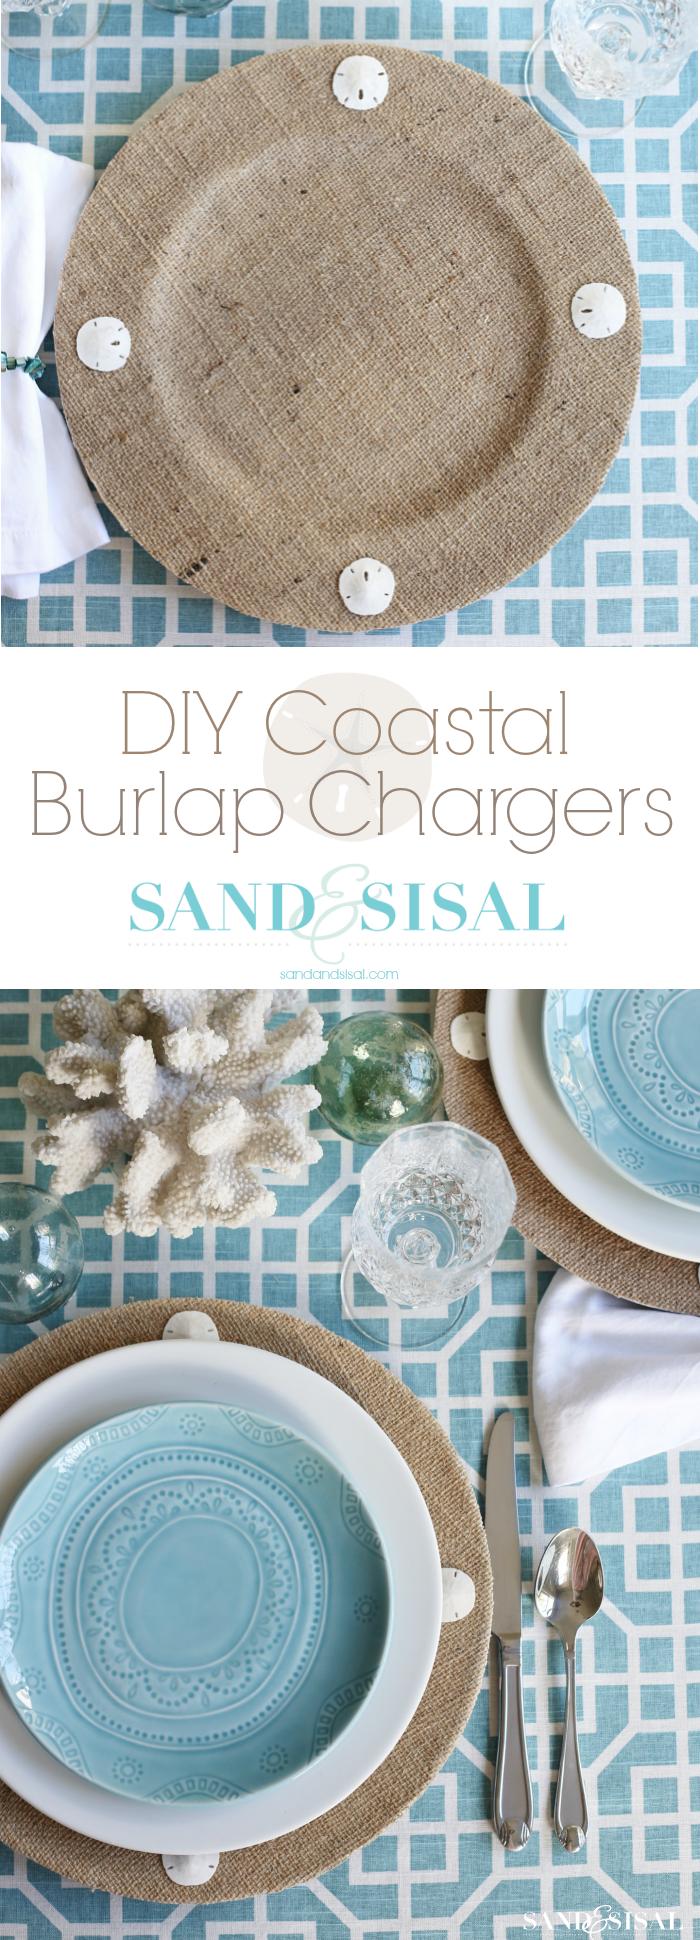 DIY-Coastal-Burlap-Chargers-sandandsisal.com_